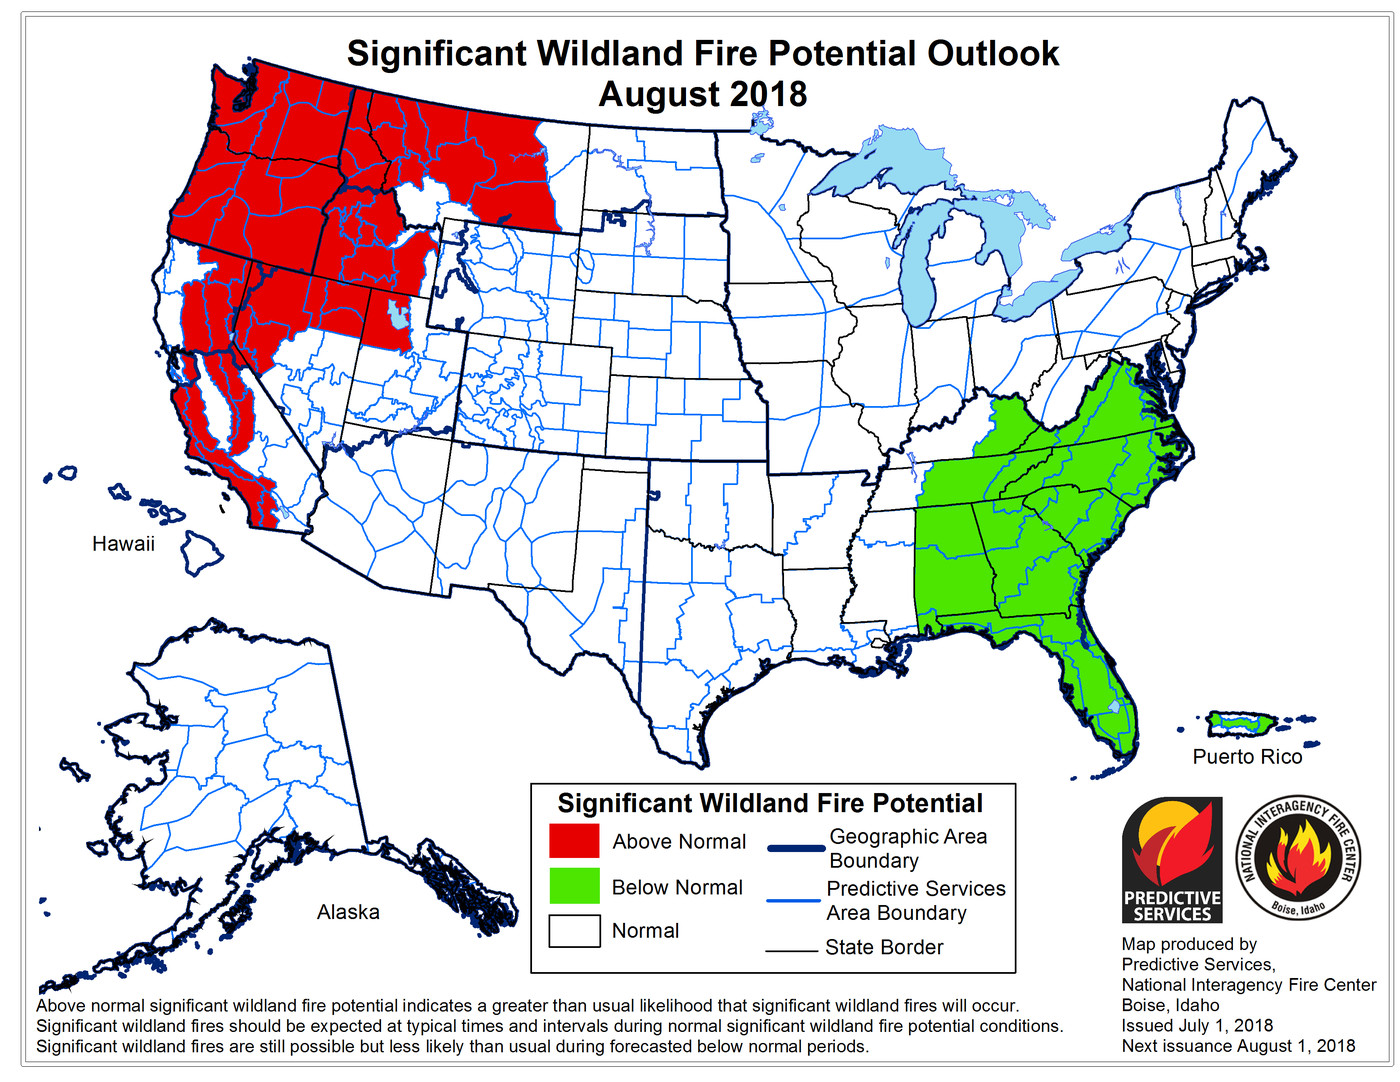 Colorado Wildfire Map on